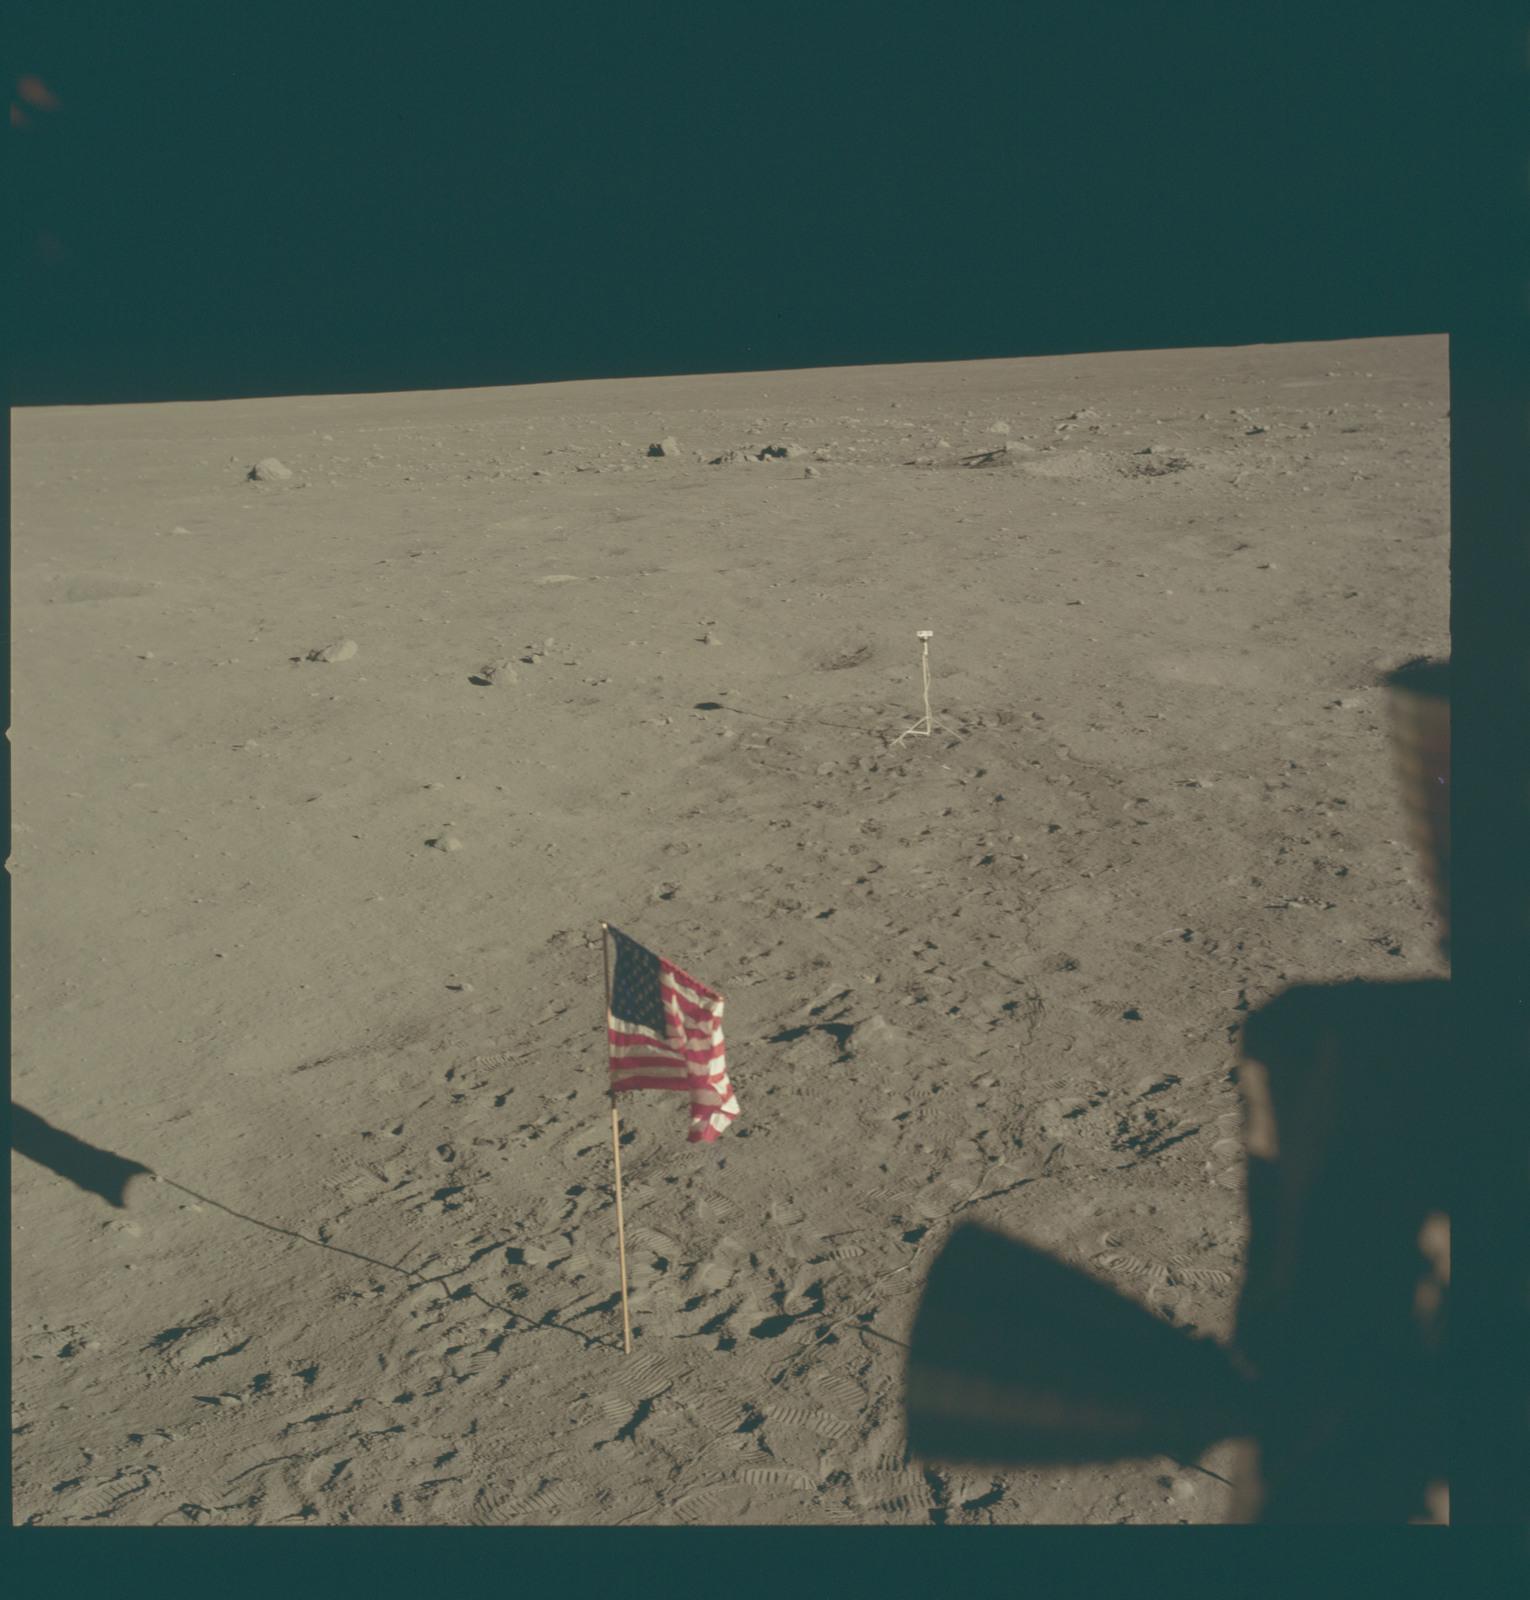 AS11-37-5480 - Apollo 11 - Apollo 11 Mission image - Lunar horizon from Tranquility Base